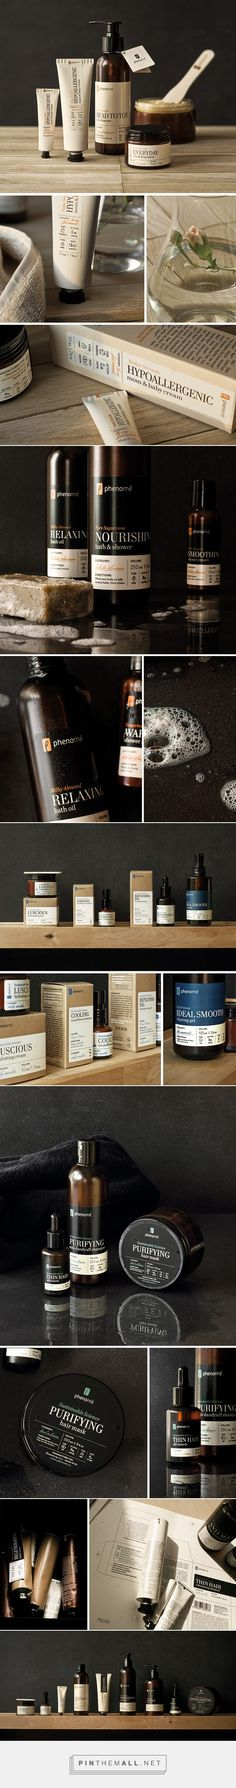 Phenome Organic Skincare Product Packaging by Ah&Oh Studio | Logo Designer Bradenton, Web Design Sarasota, Tampa Fivestar Branding Agency #skincare #skincareproducts #skincarepackaging #packaging #packagingdesign #packaginginspiration #package #packagedesign #design #labels